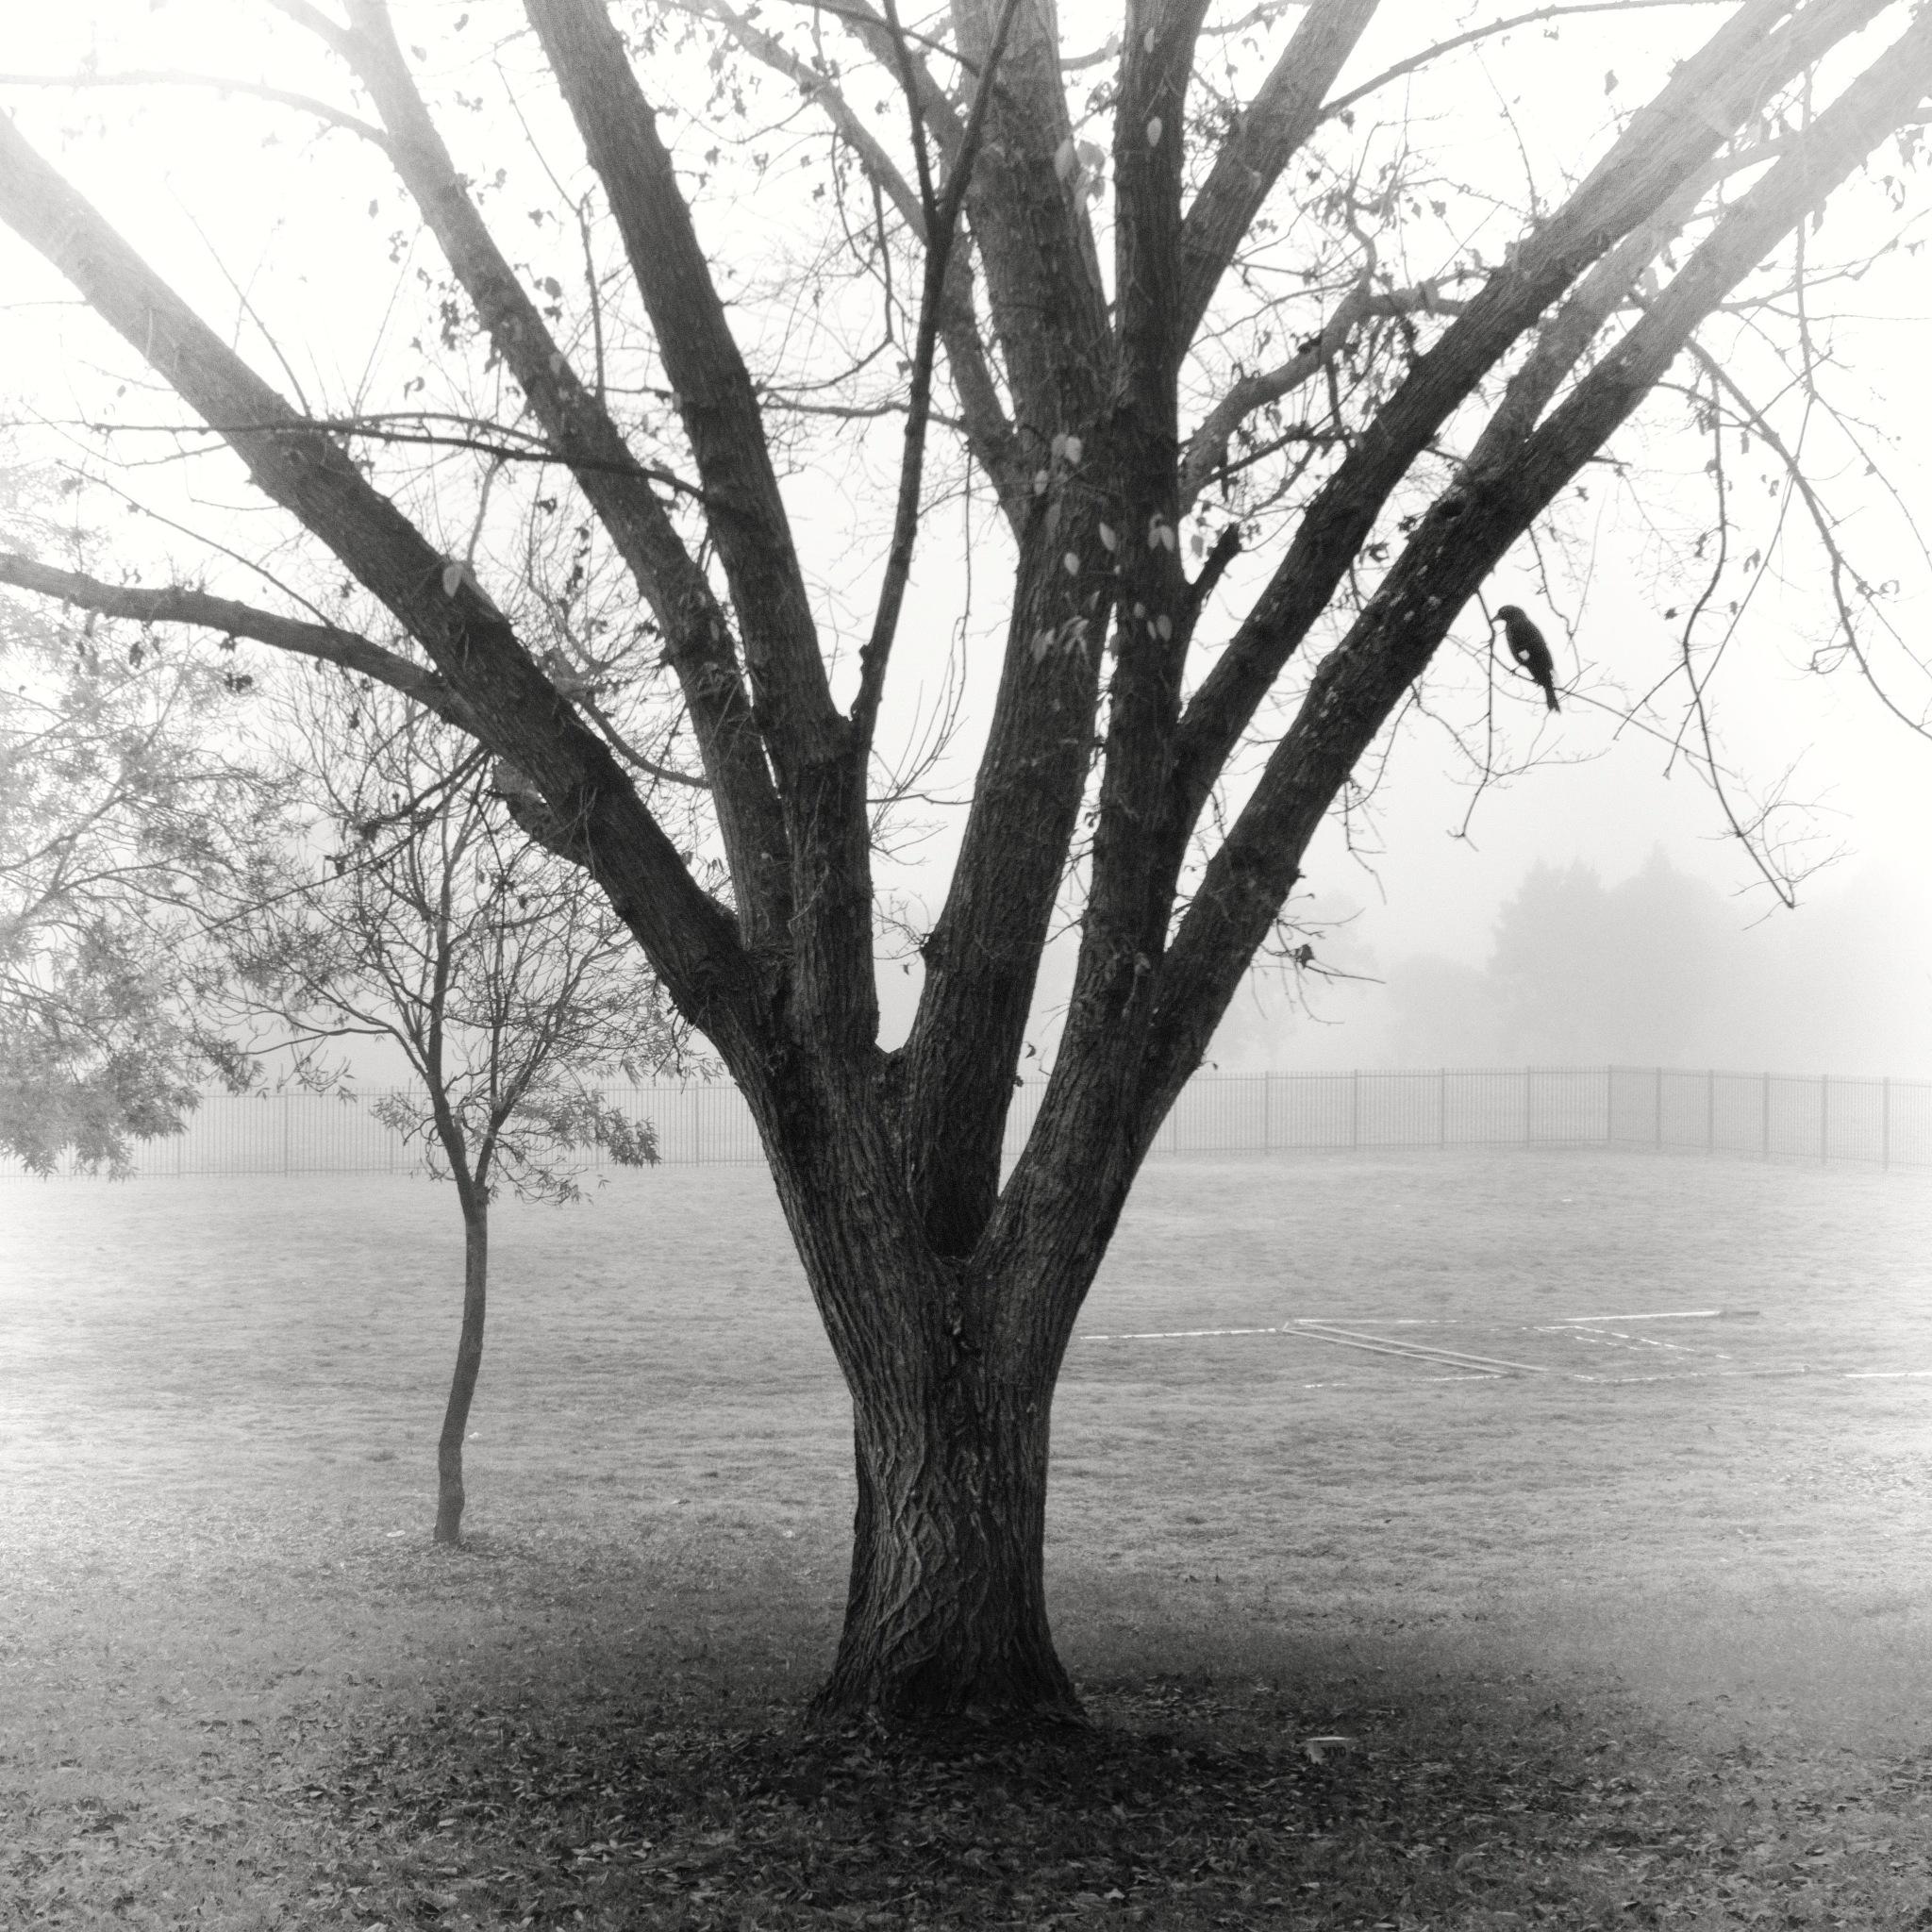 Tree at school by TonyG